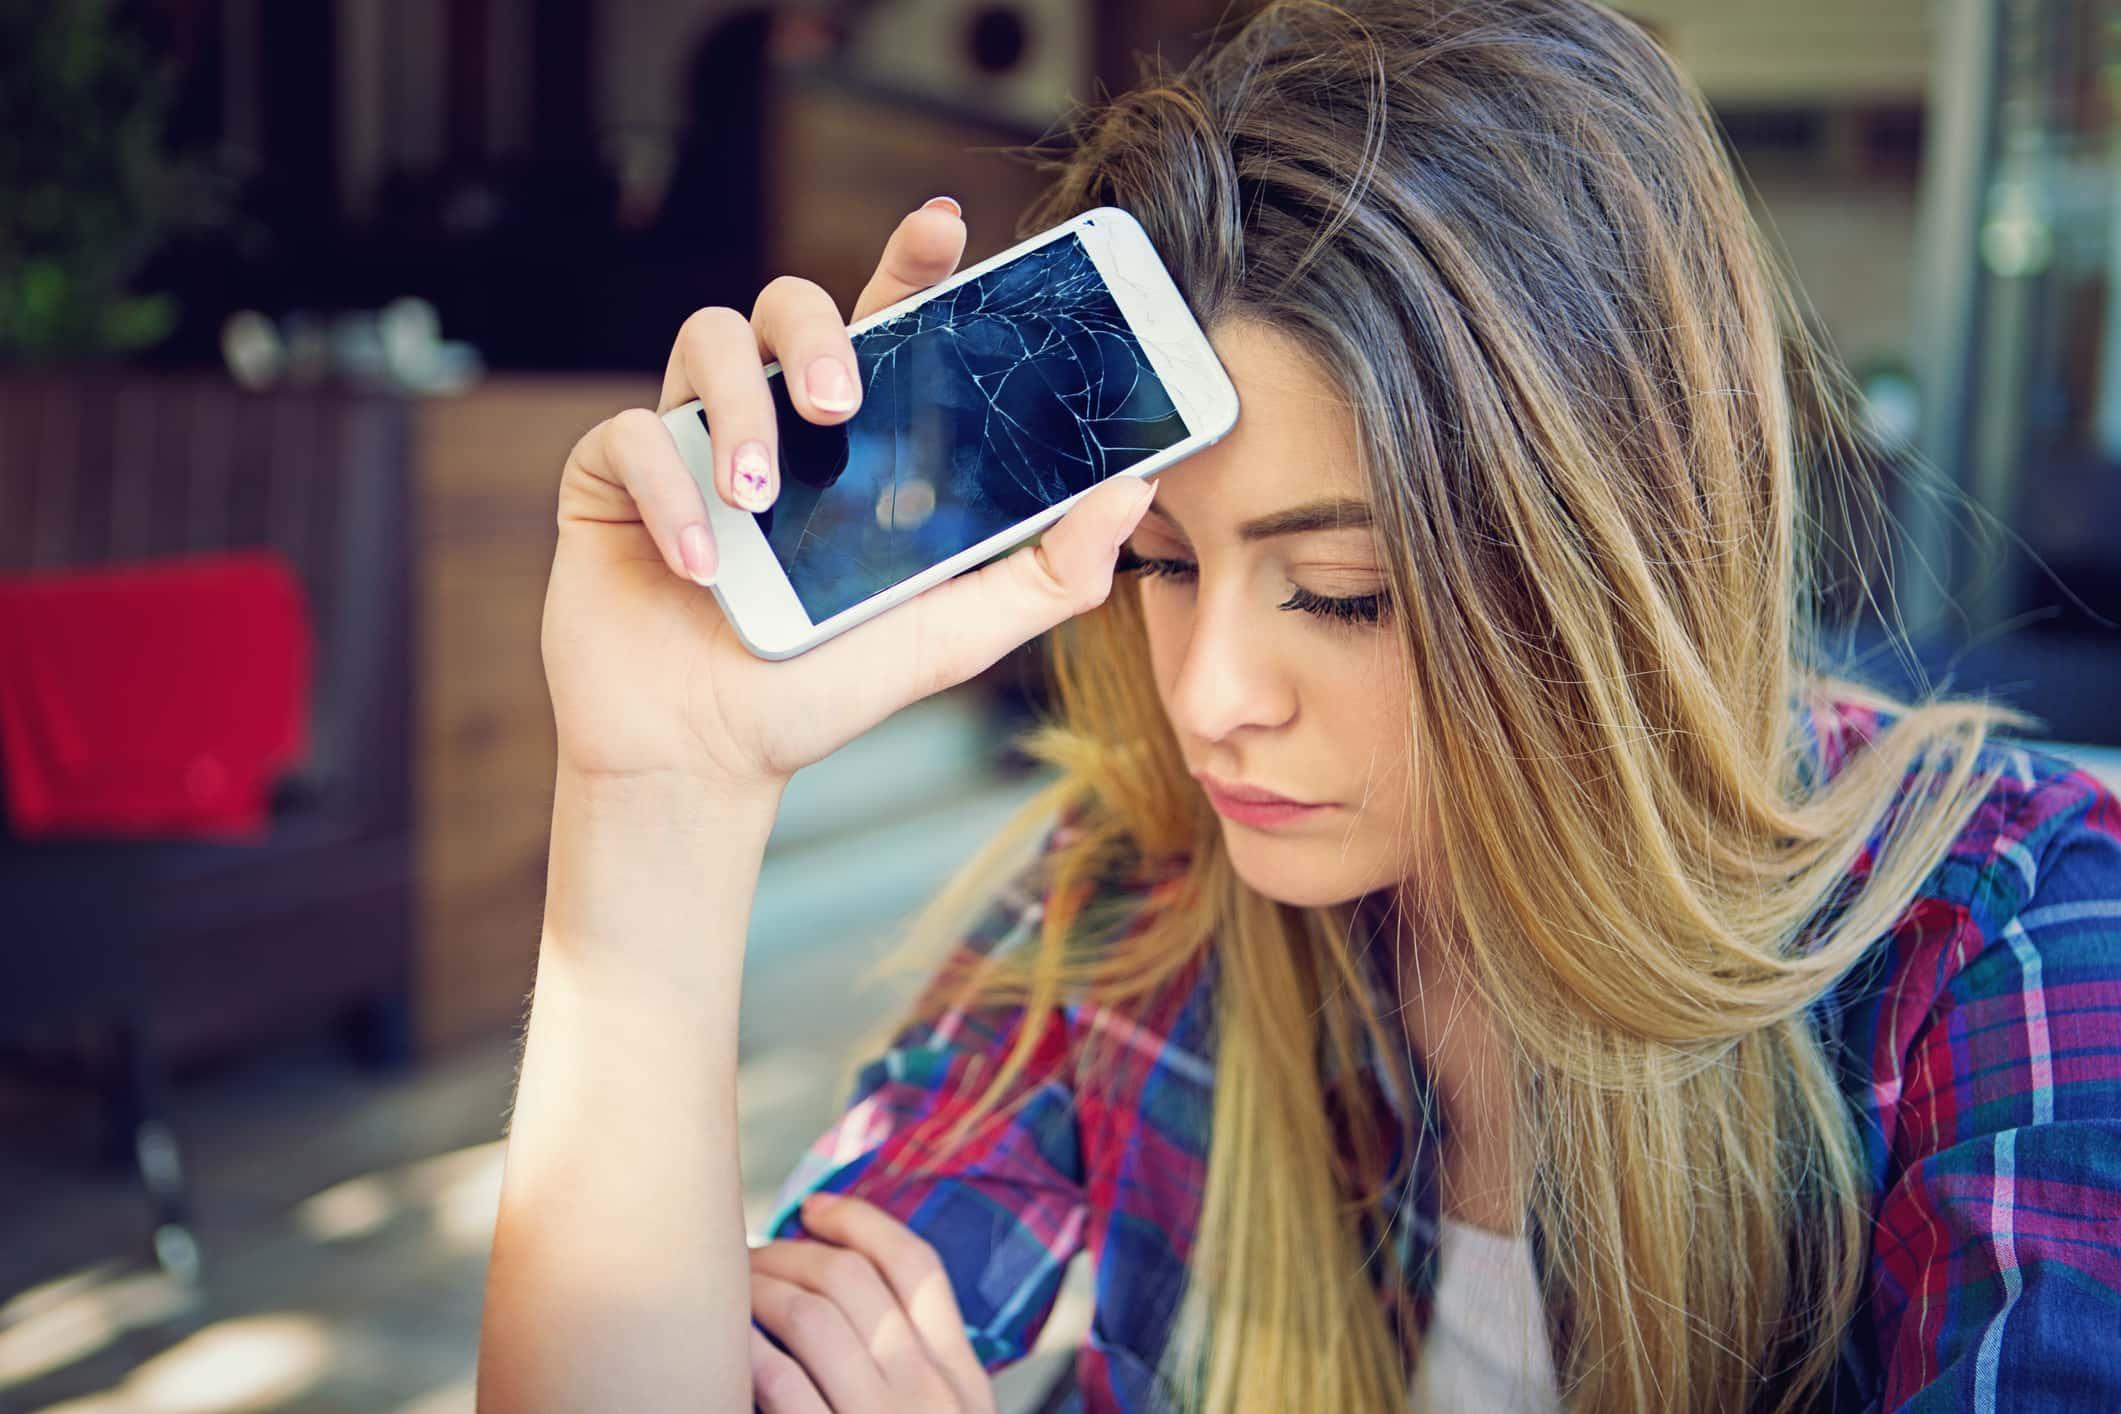 Broken mobile phone.